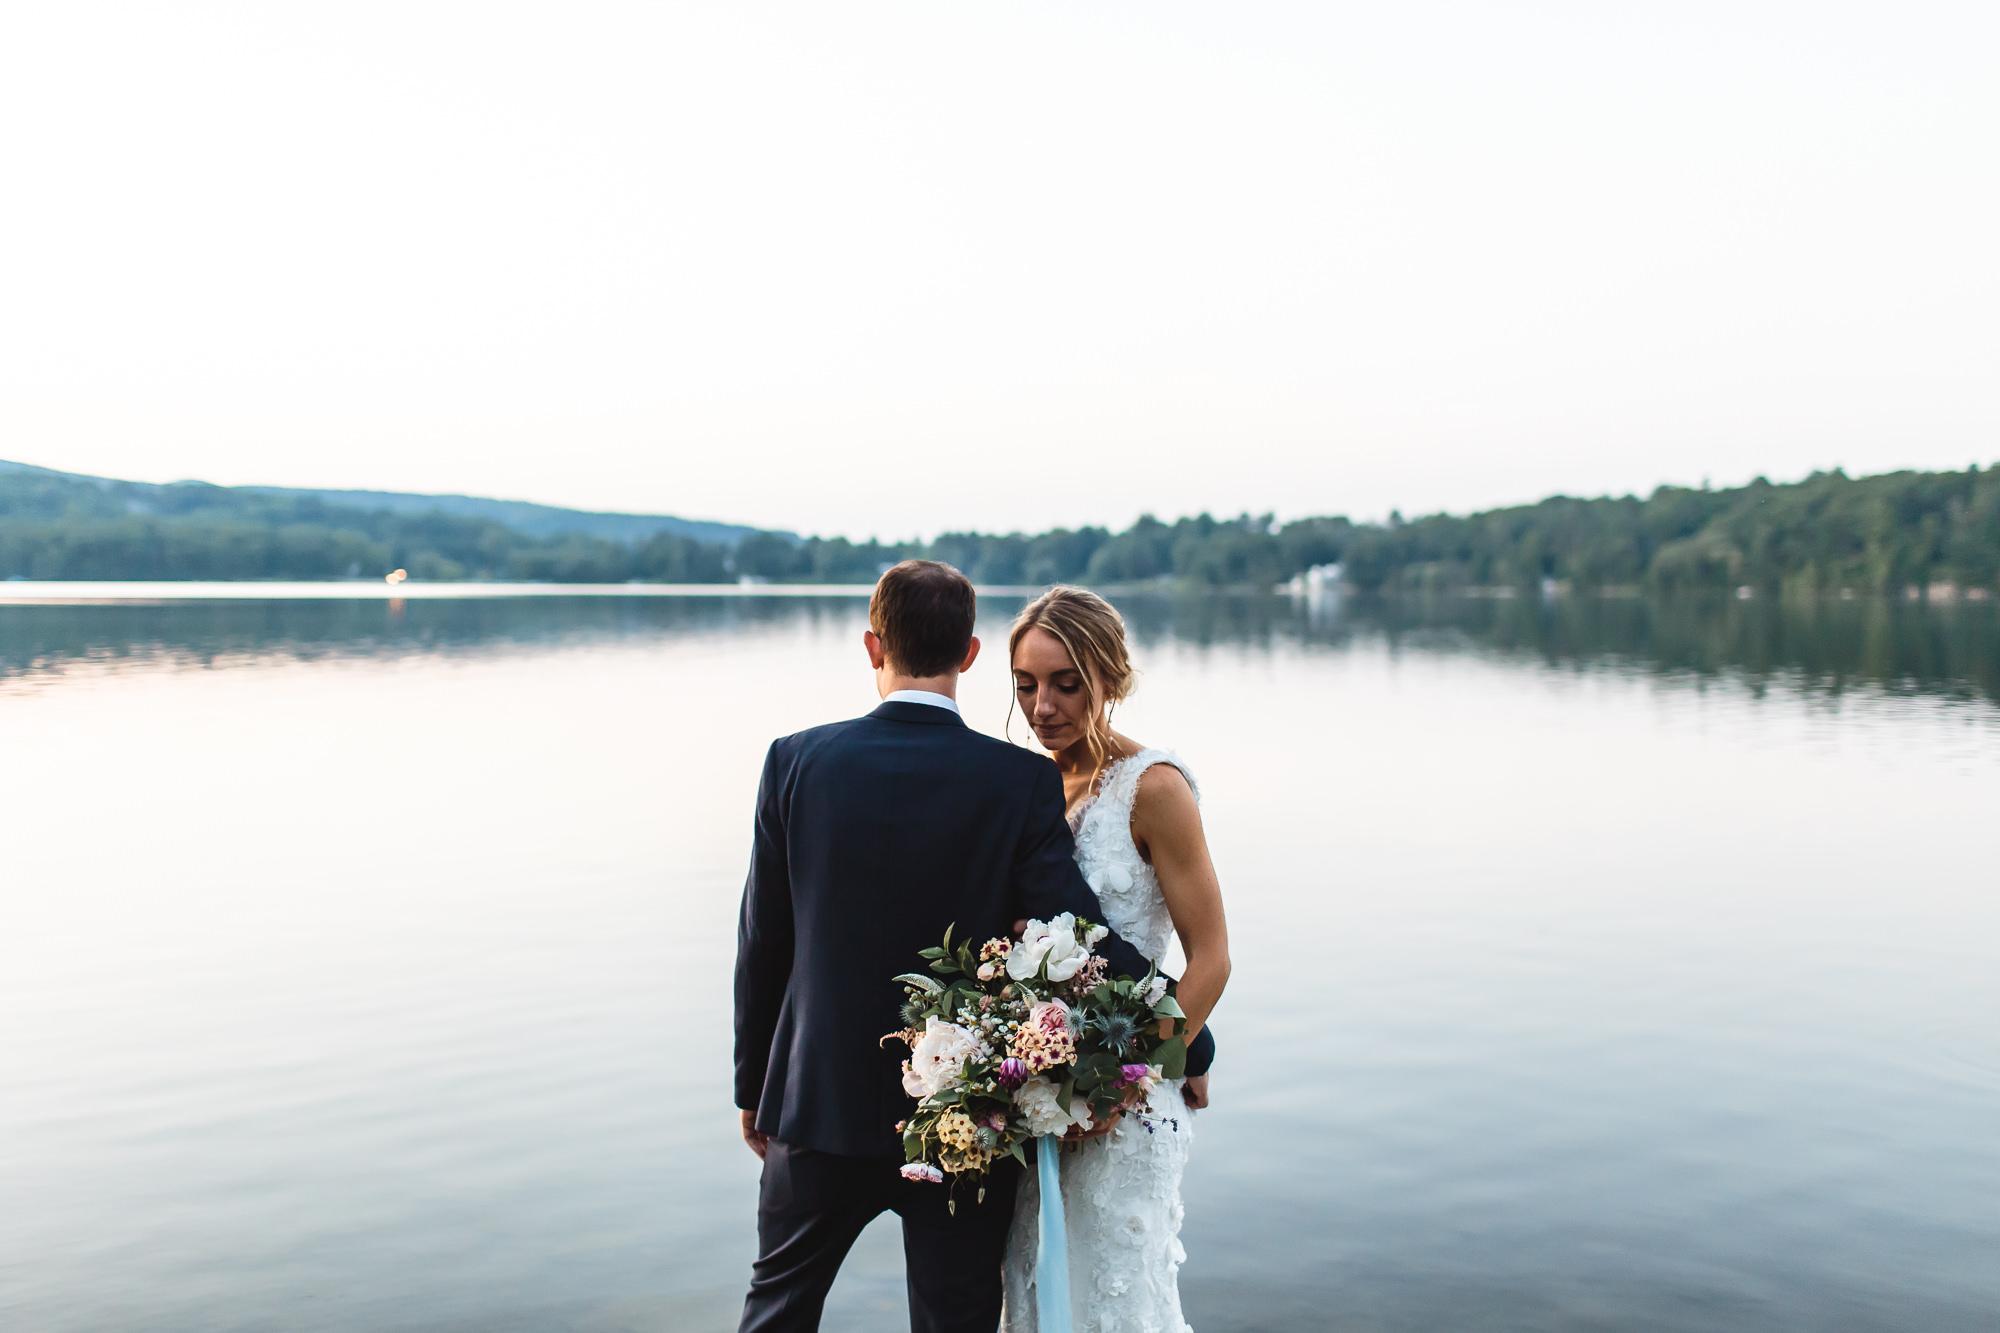 connecticut-summer-lake-wedding-emily-kirke-photography-upstyle (160 of 181).jpg